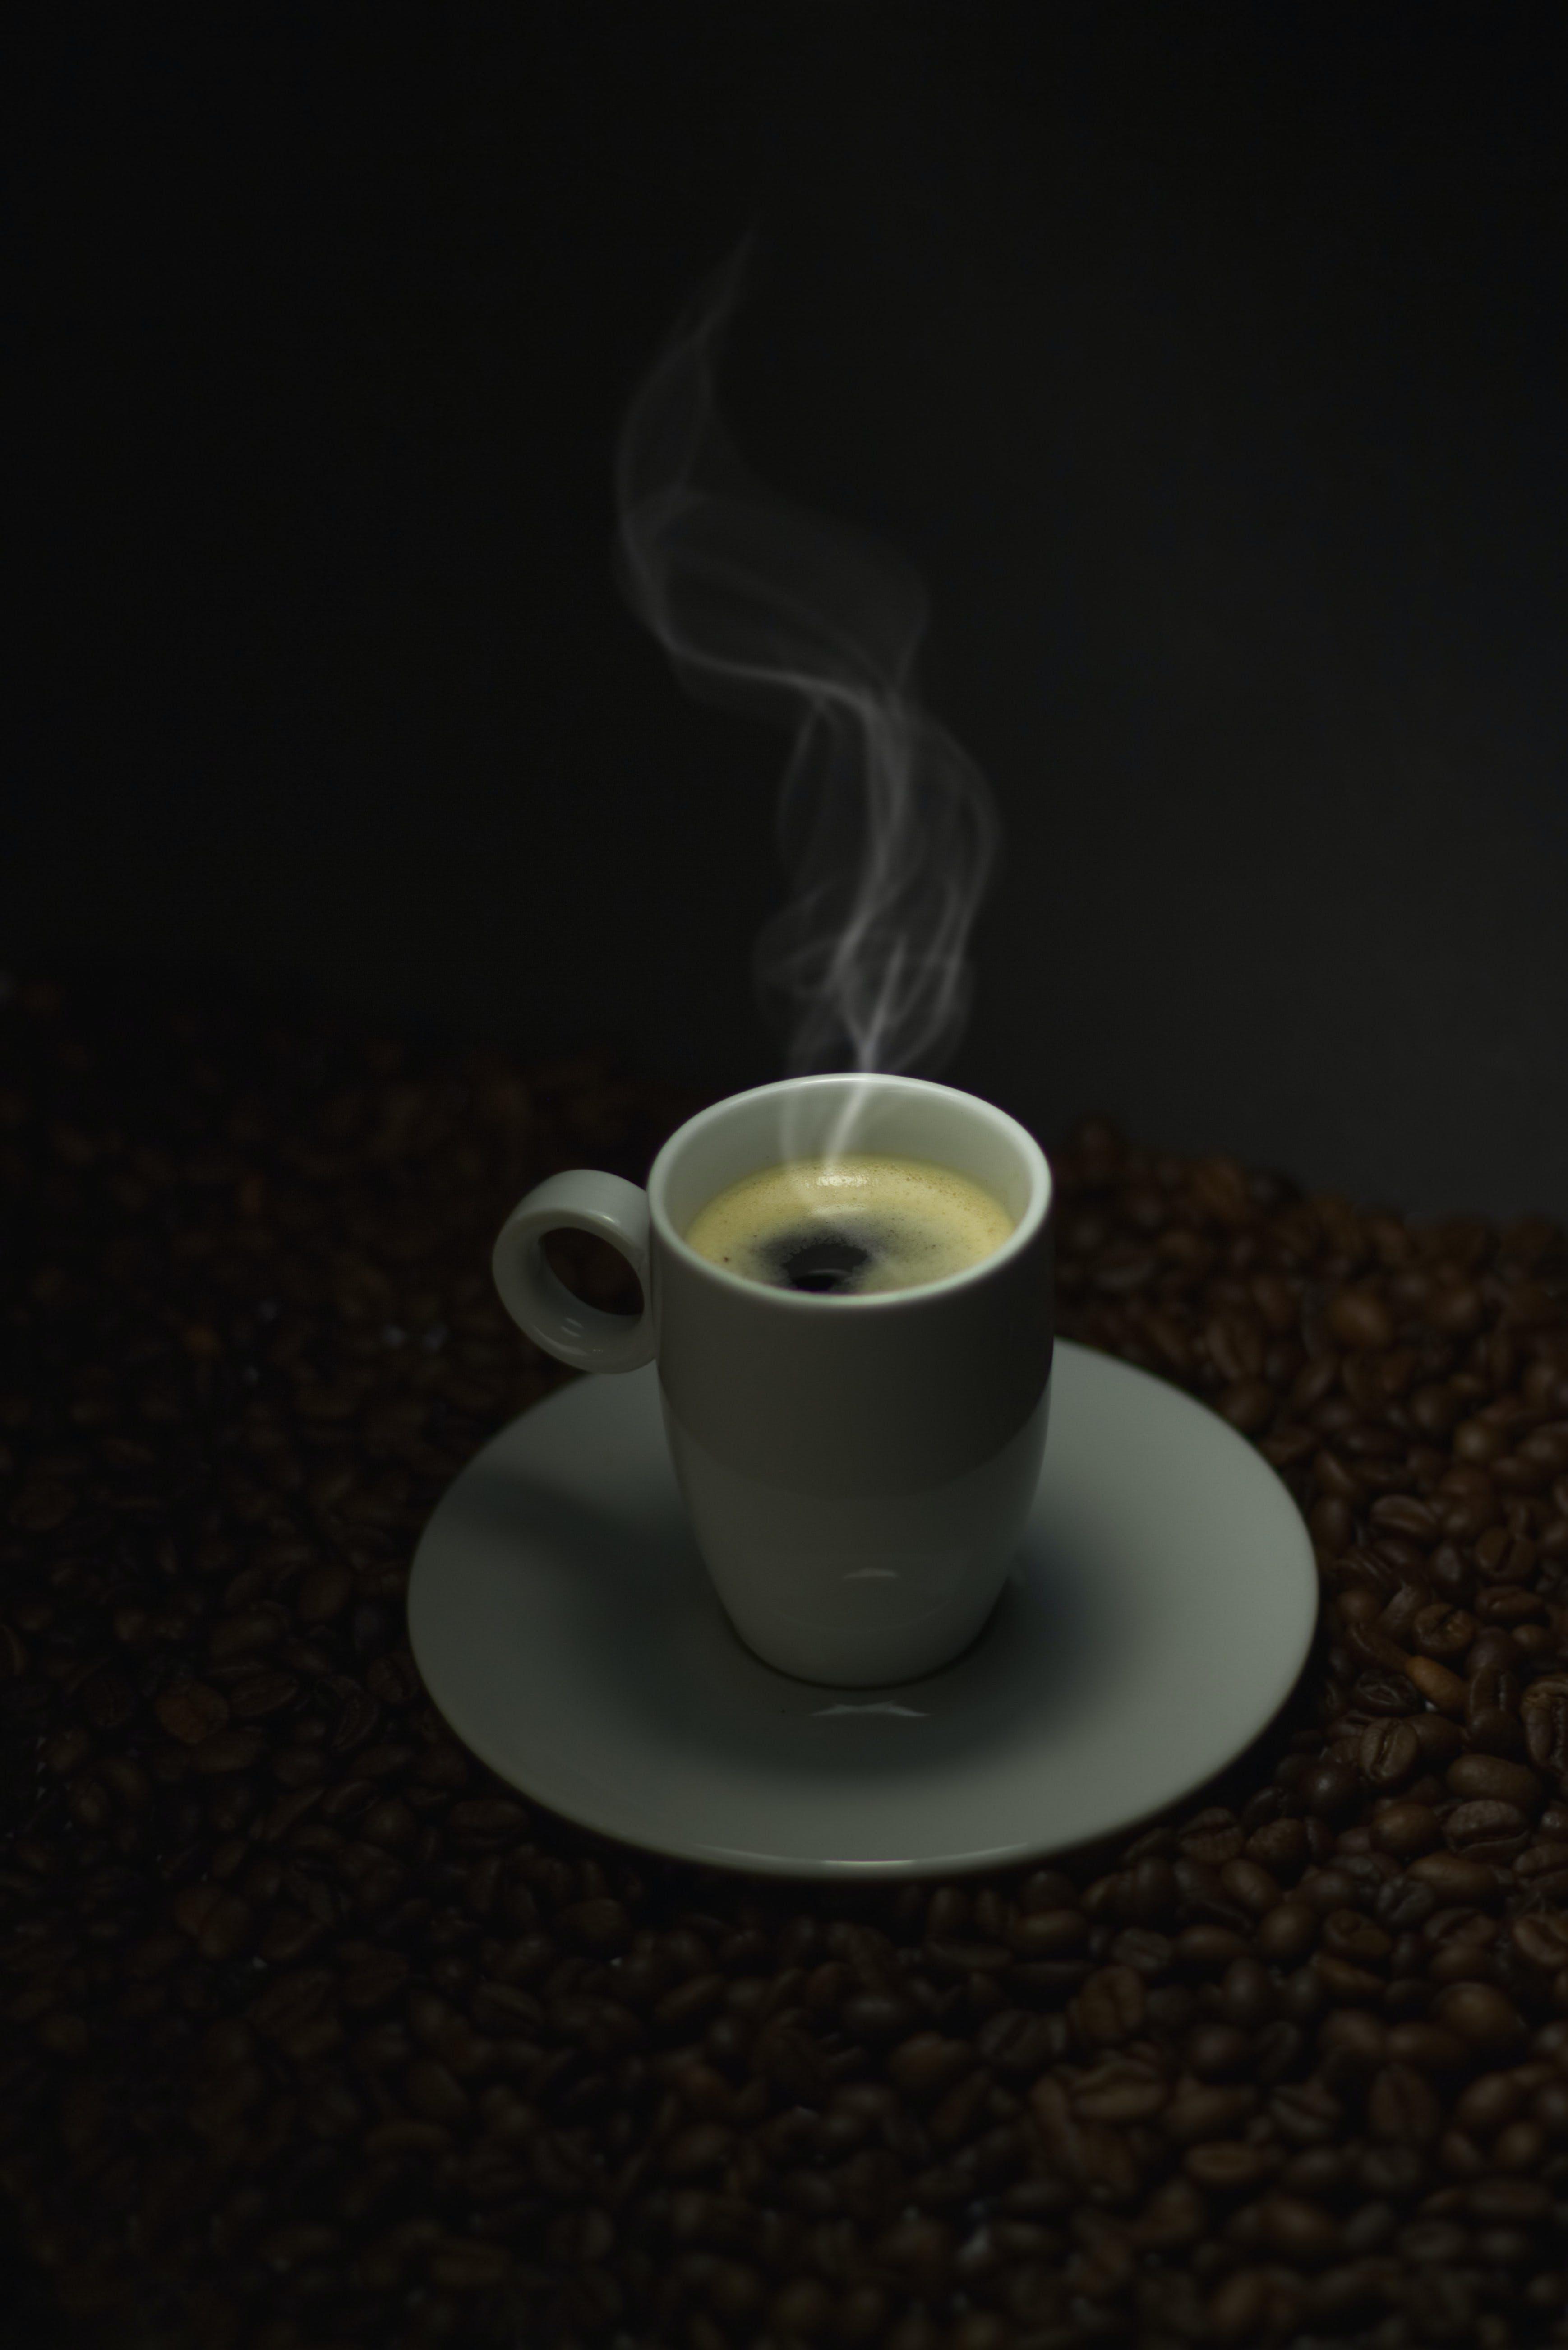 Free stock photo of black coffee, coffee, coffee beans, hot